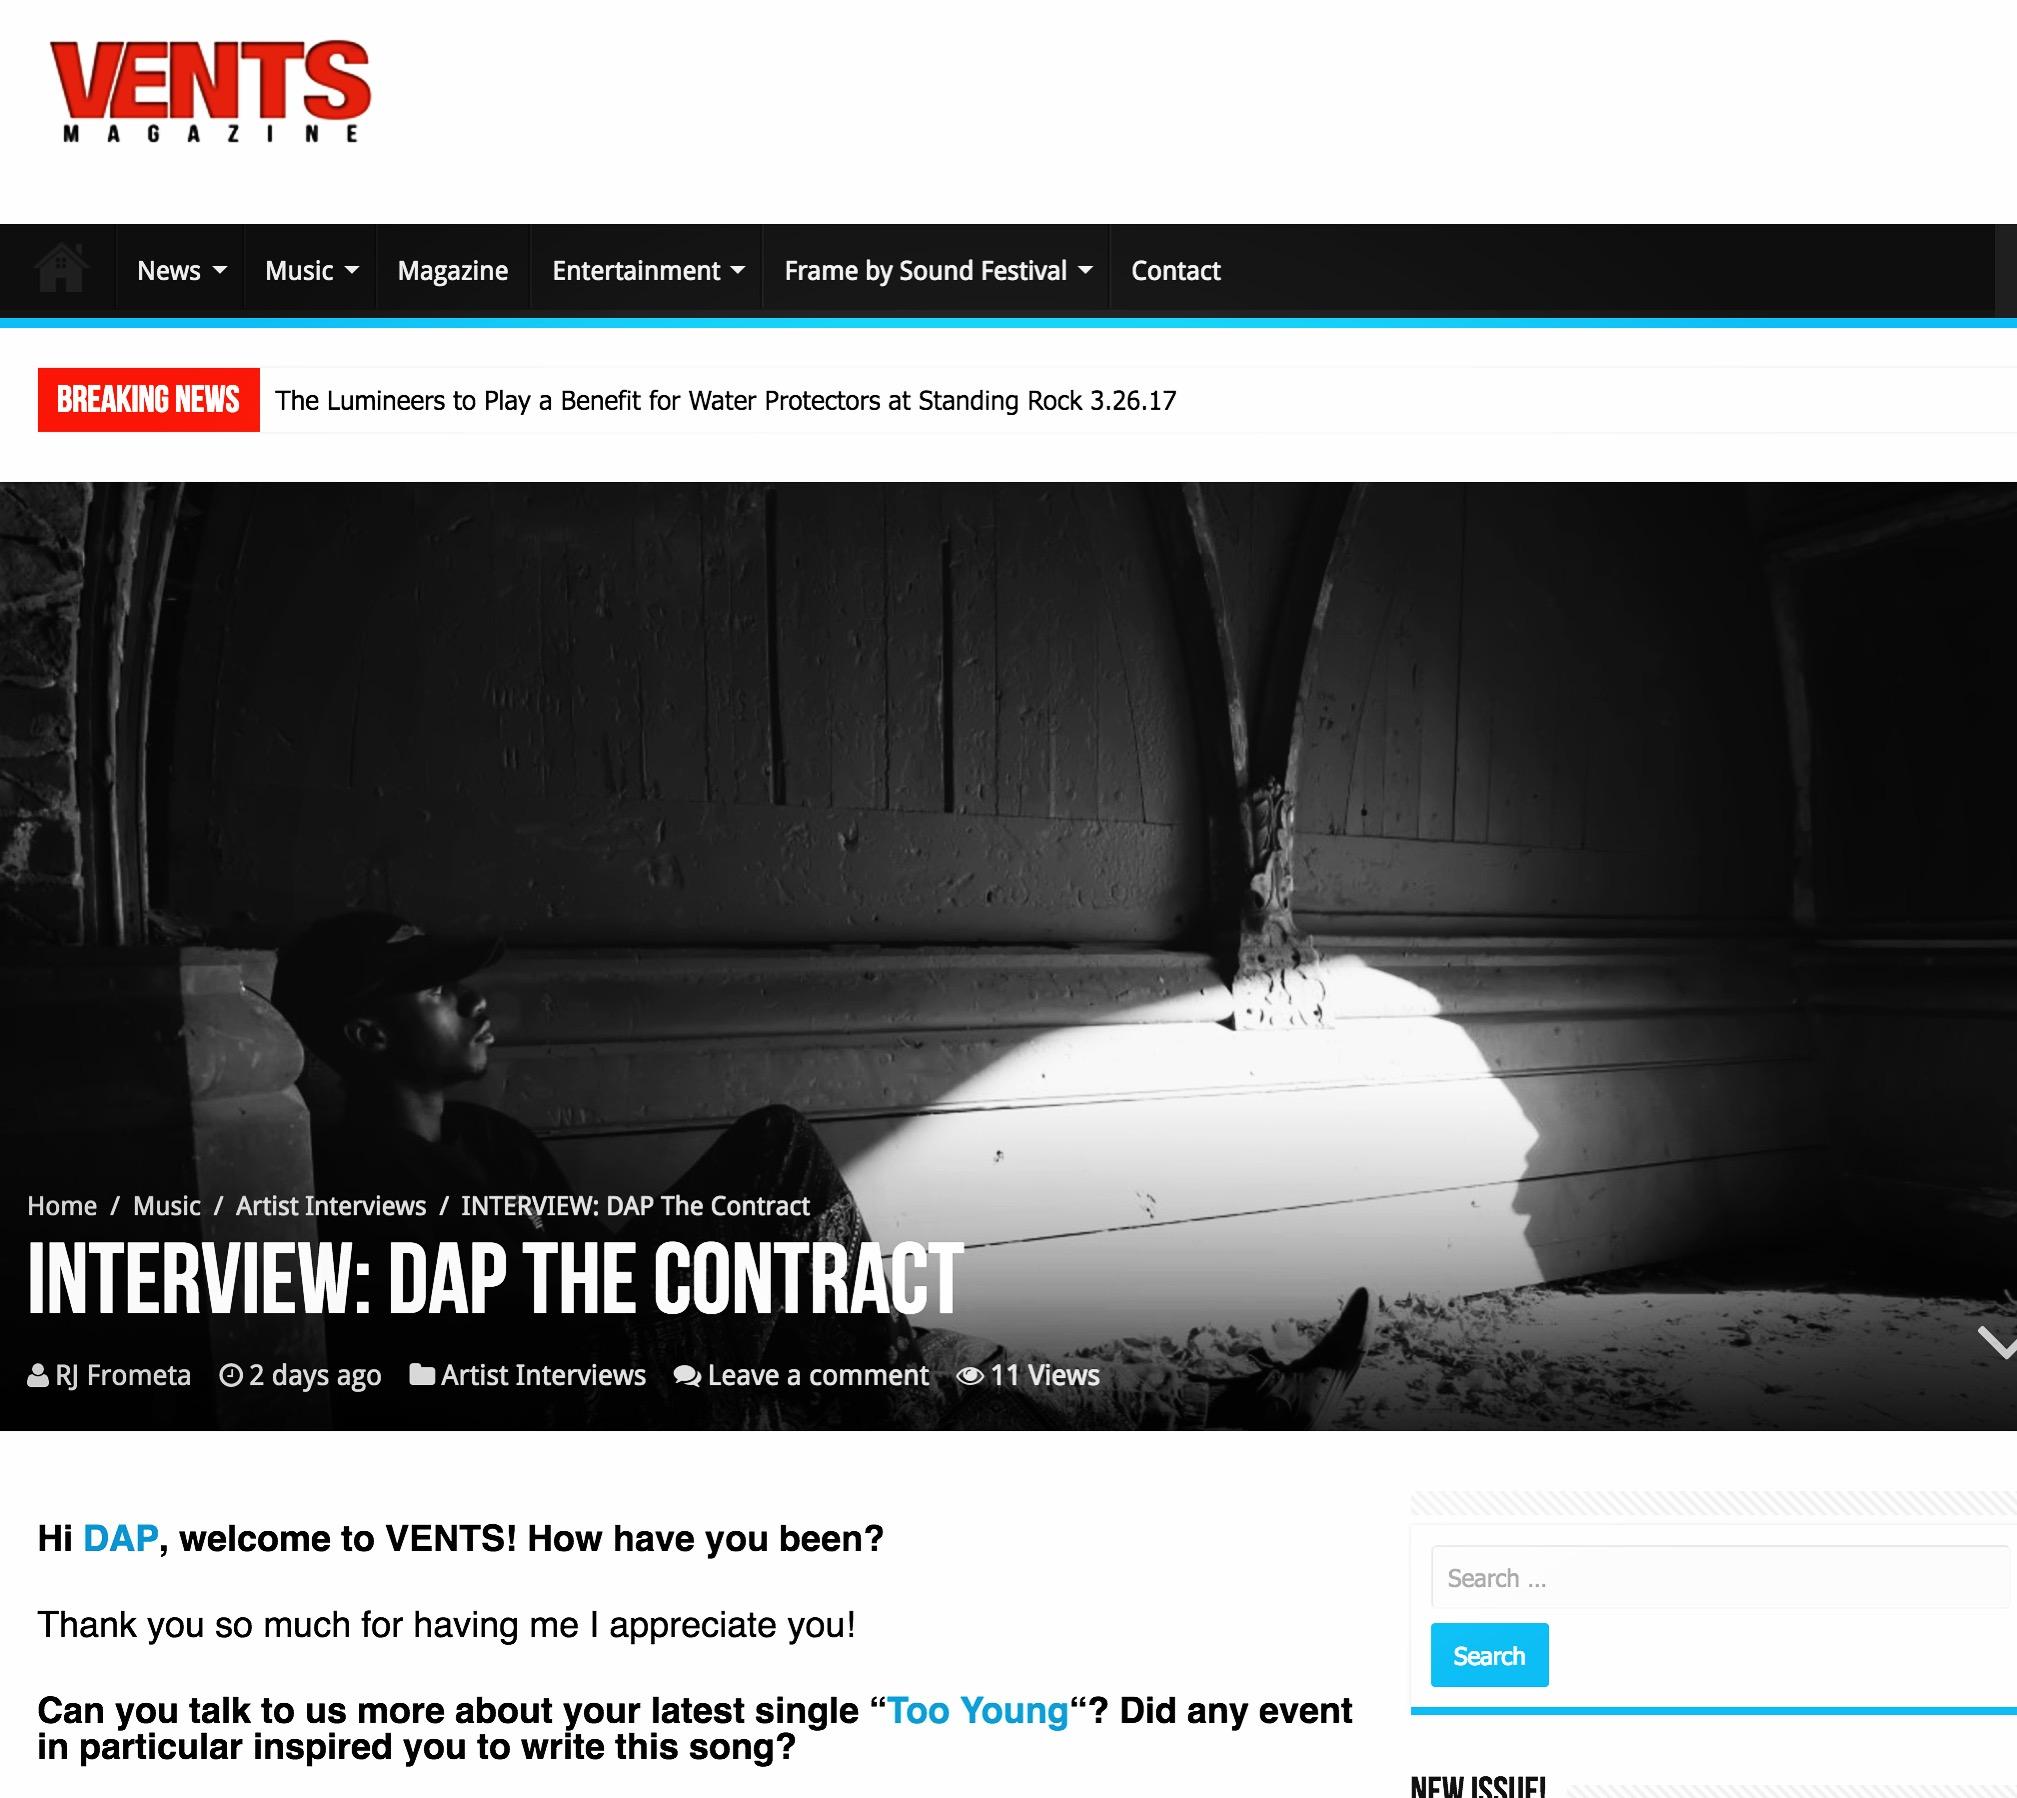 http://ventsmagazine.com/2017/03/04/interview-dap-contract/